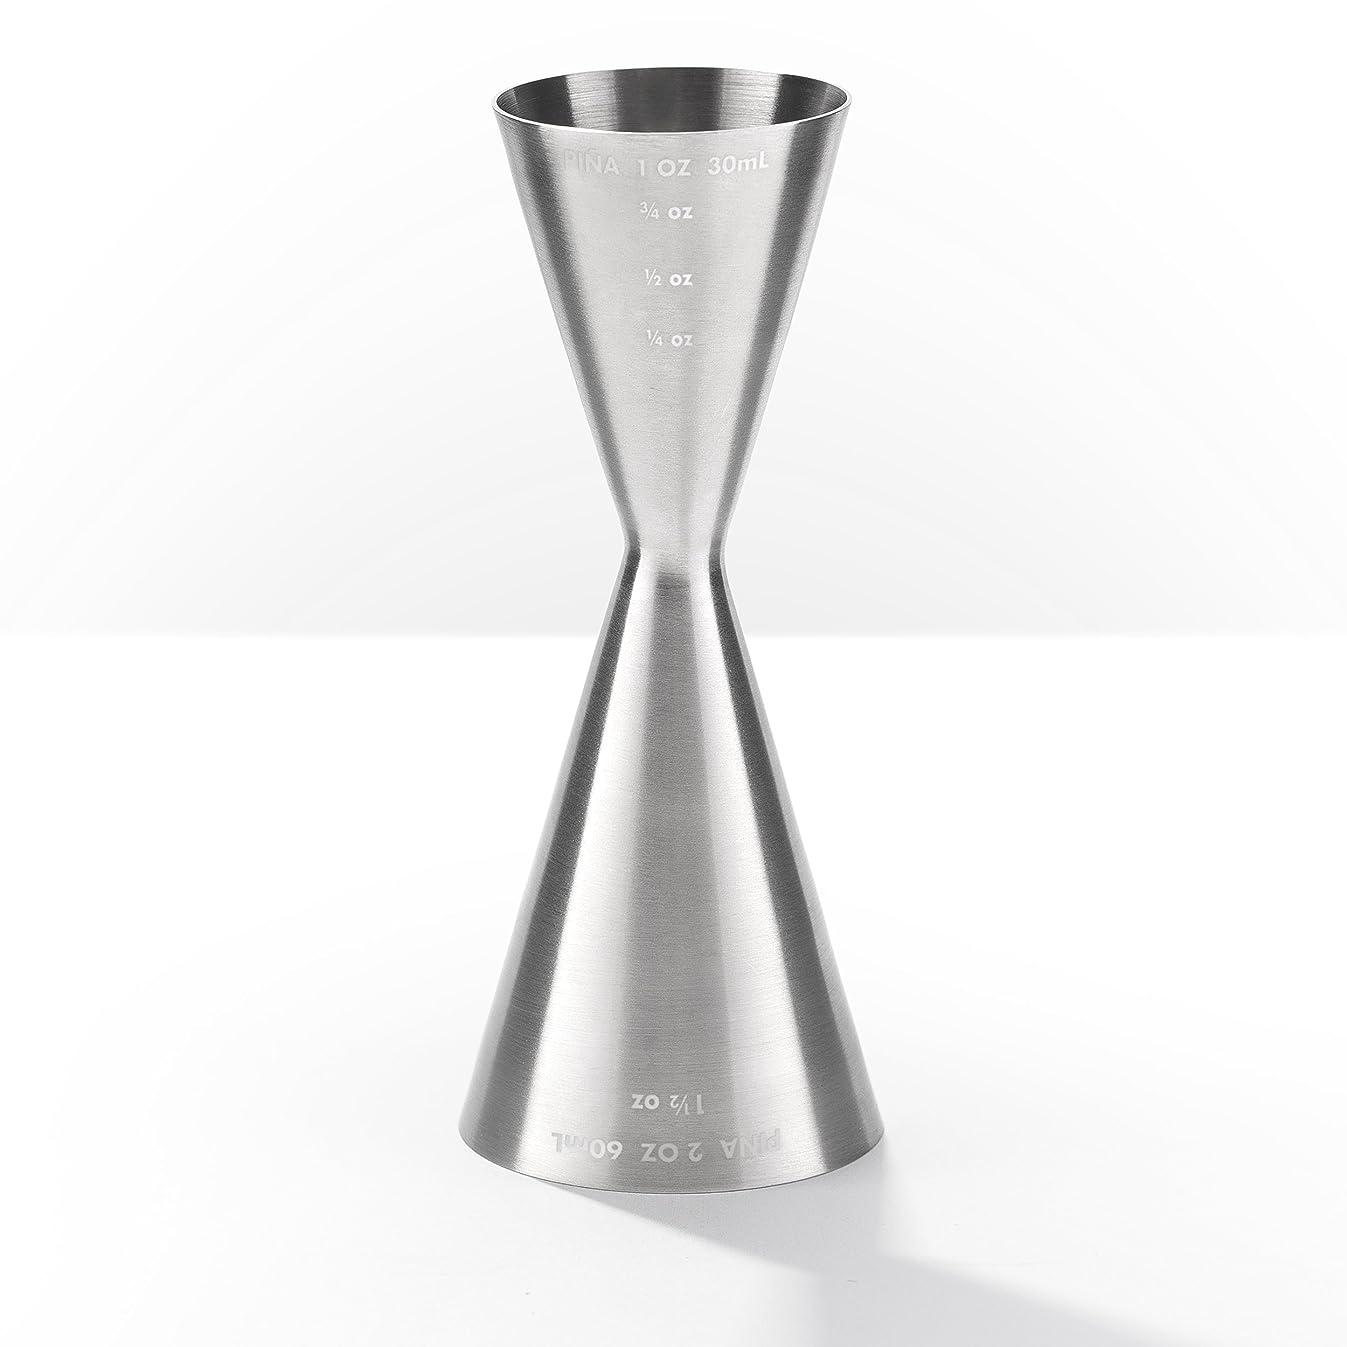 Pi?a Barware Slim Stainless Steel Commercial 2oz. / 1oz. Slim Style Measuring Jigger Bar Tool